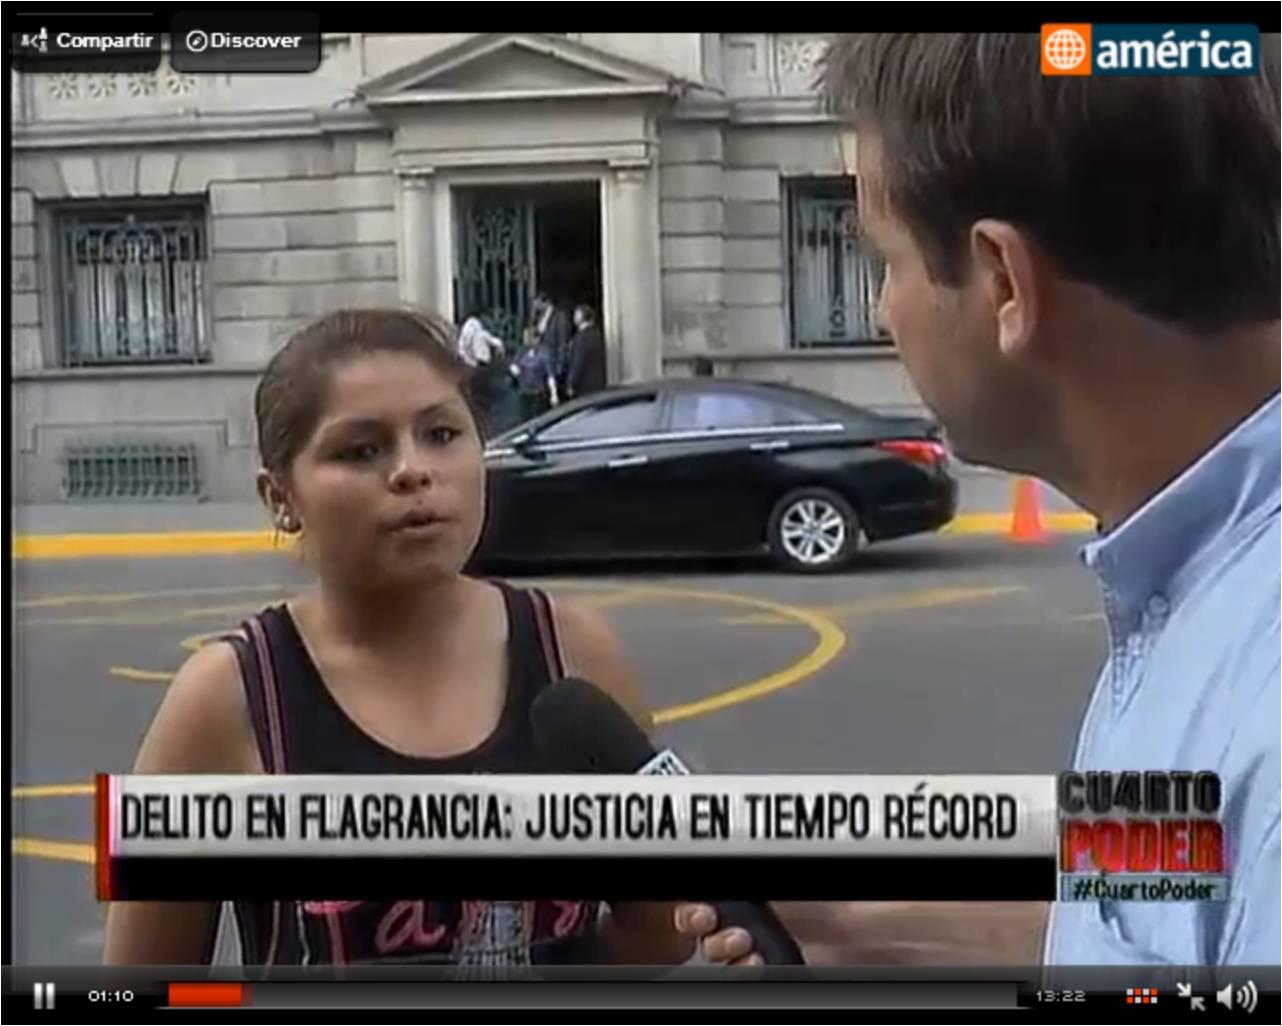 BONIFACIO MENESES GONZALESJUEZ SUPERIOR TITULAR DE LA CORTE SUPERIOR ...